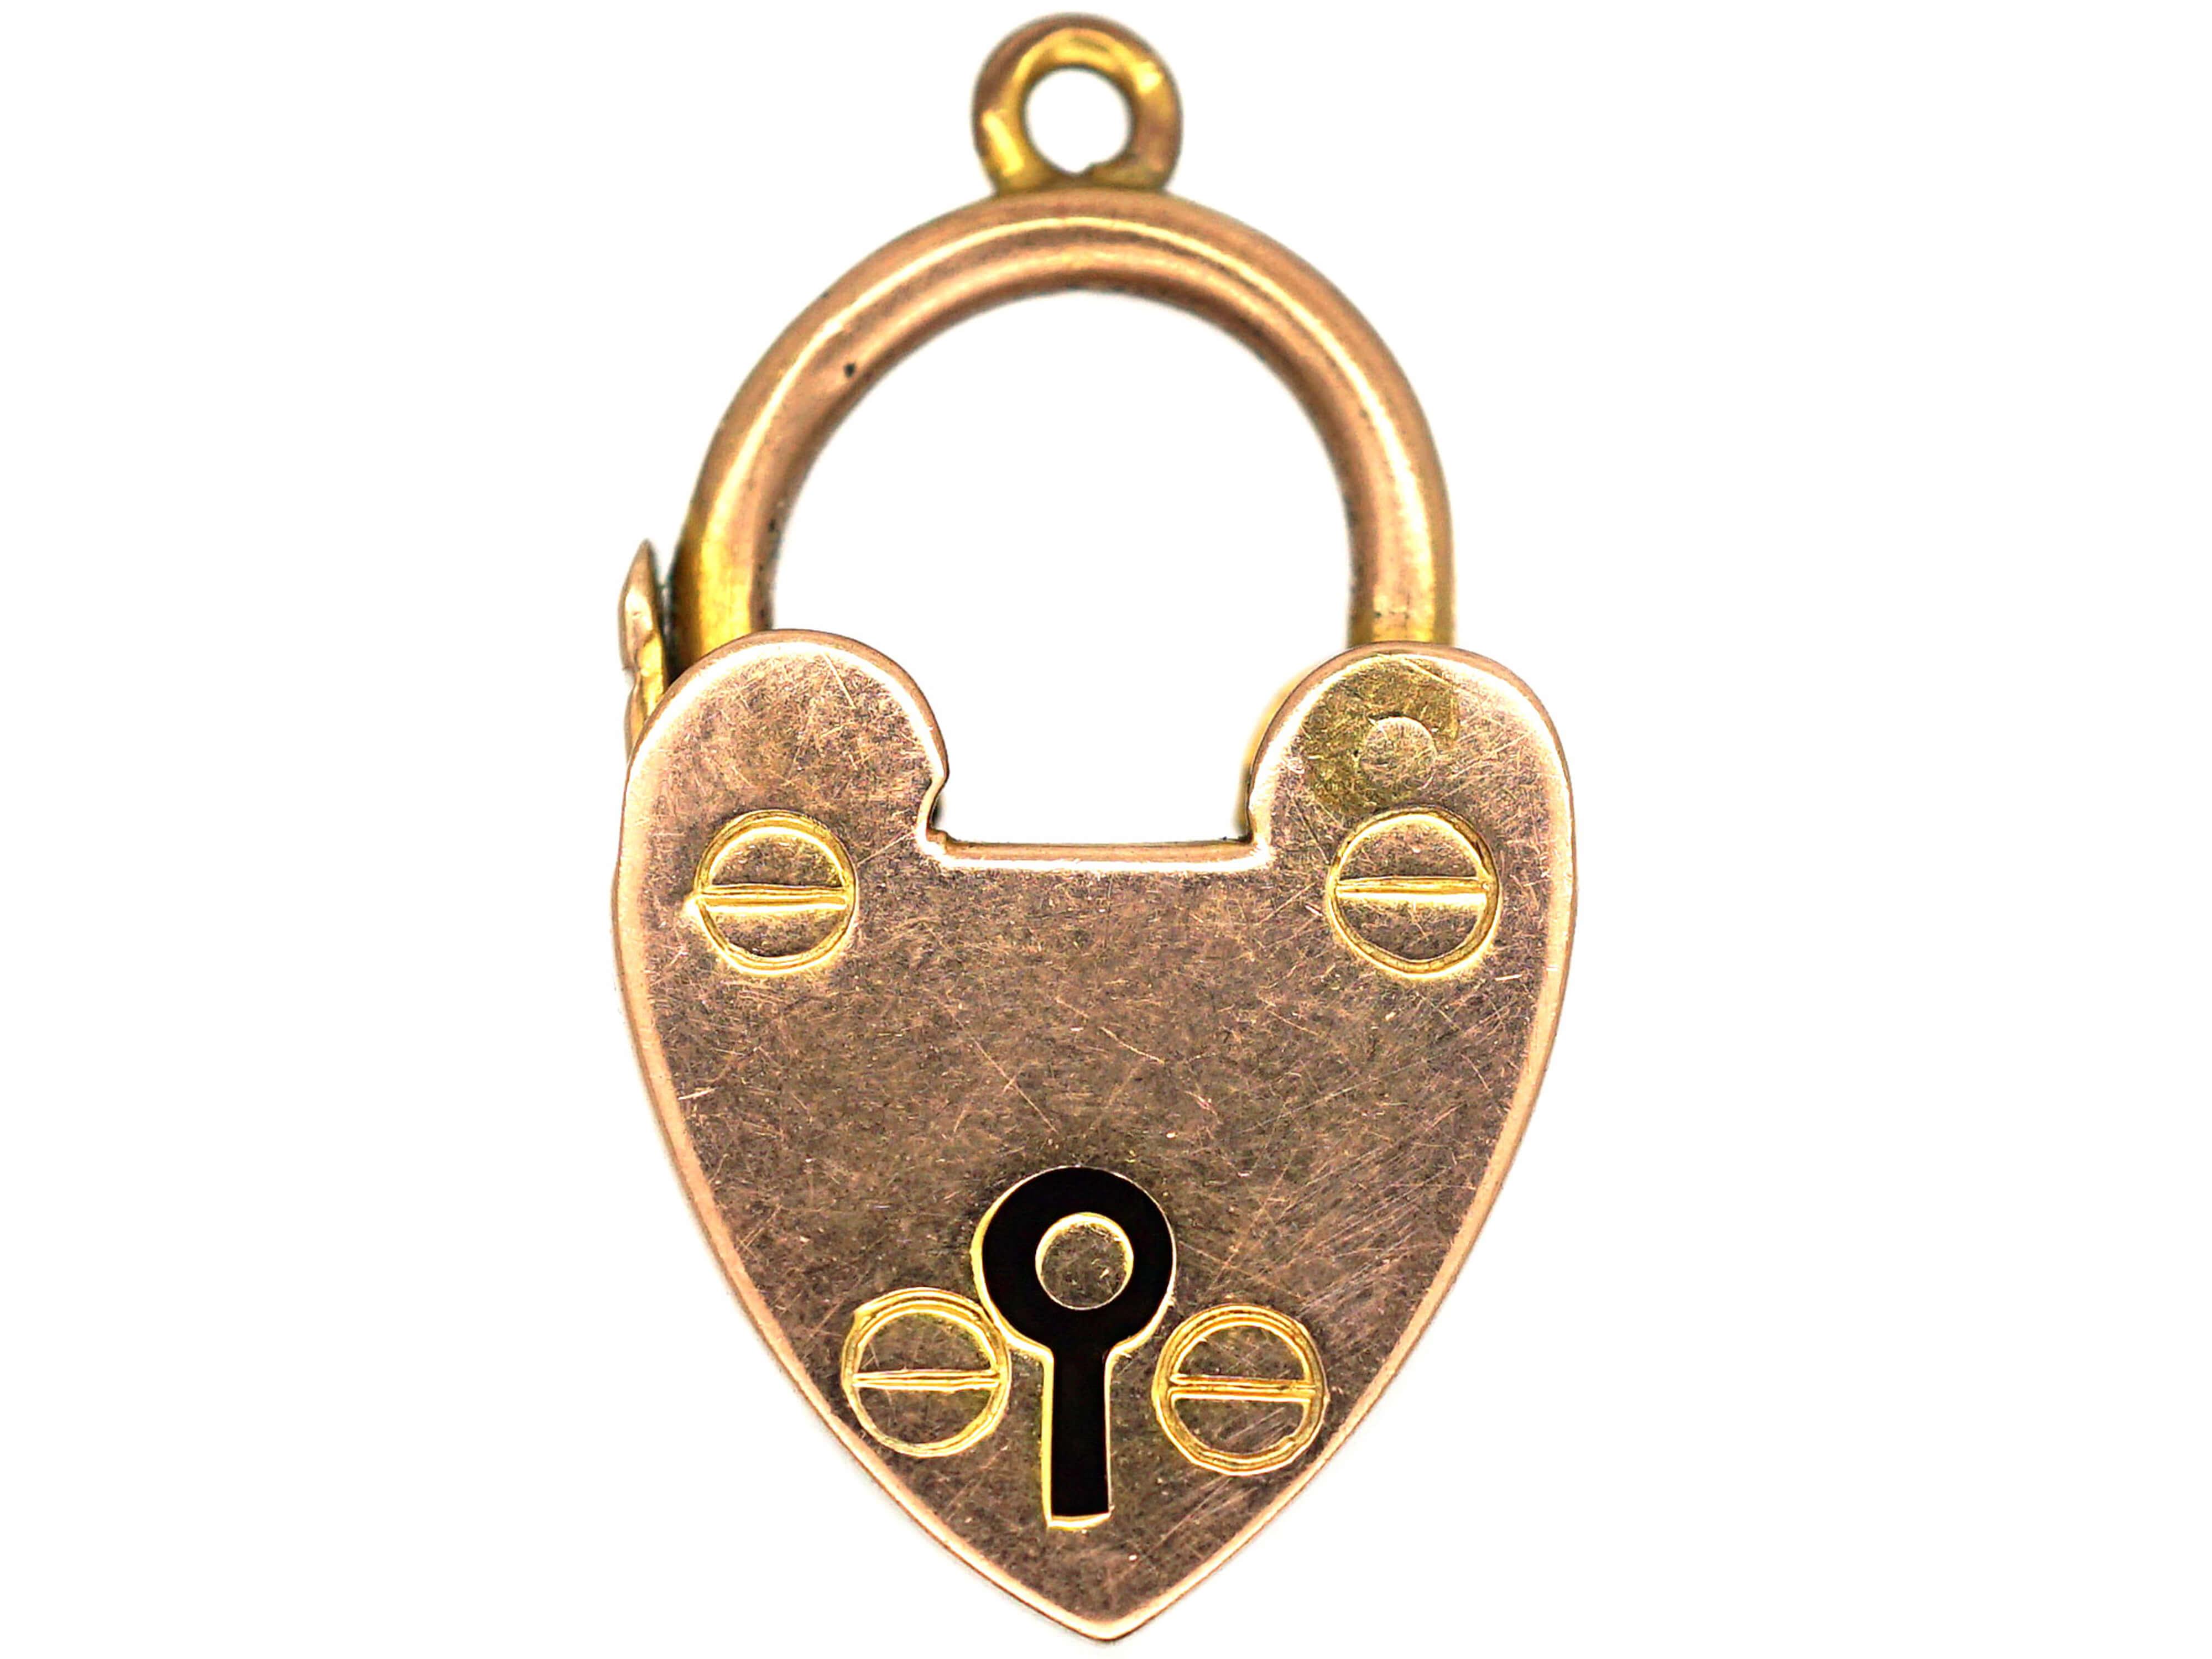 Edwardian 9ct Gold Heart Shaped Padlock